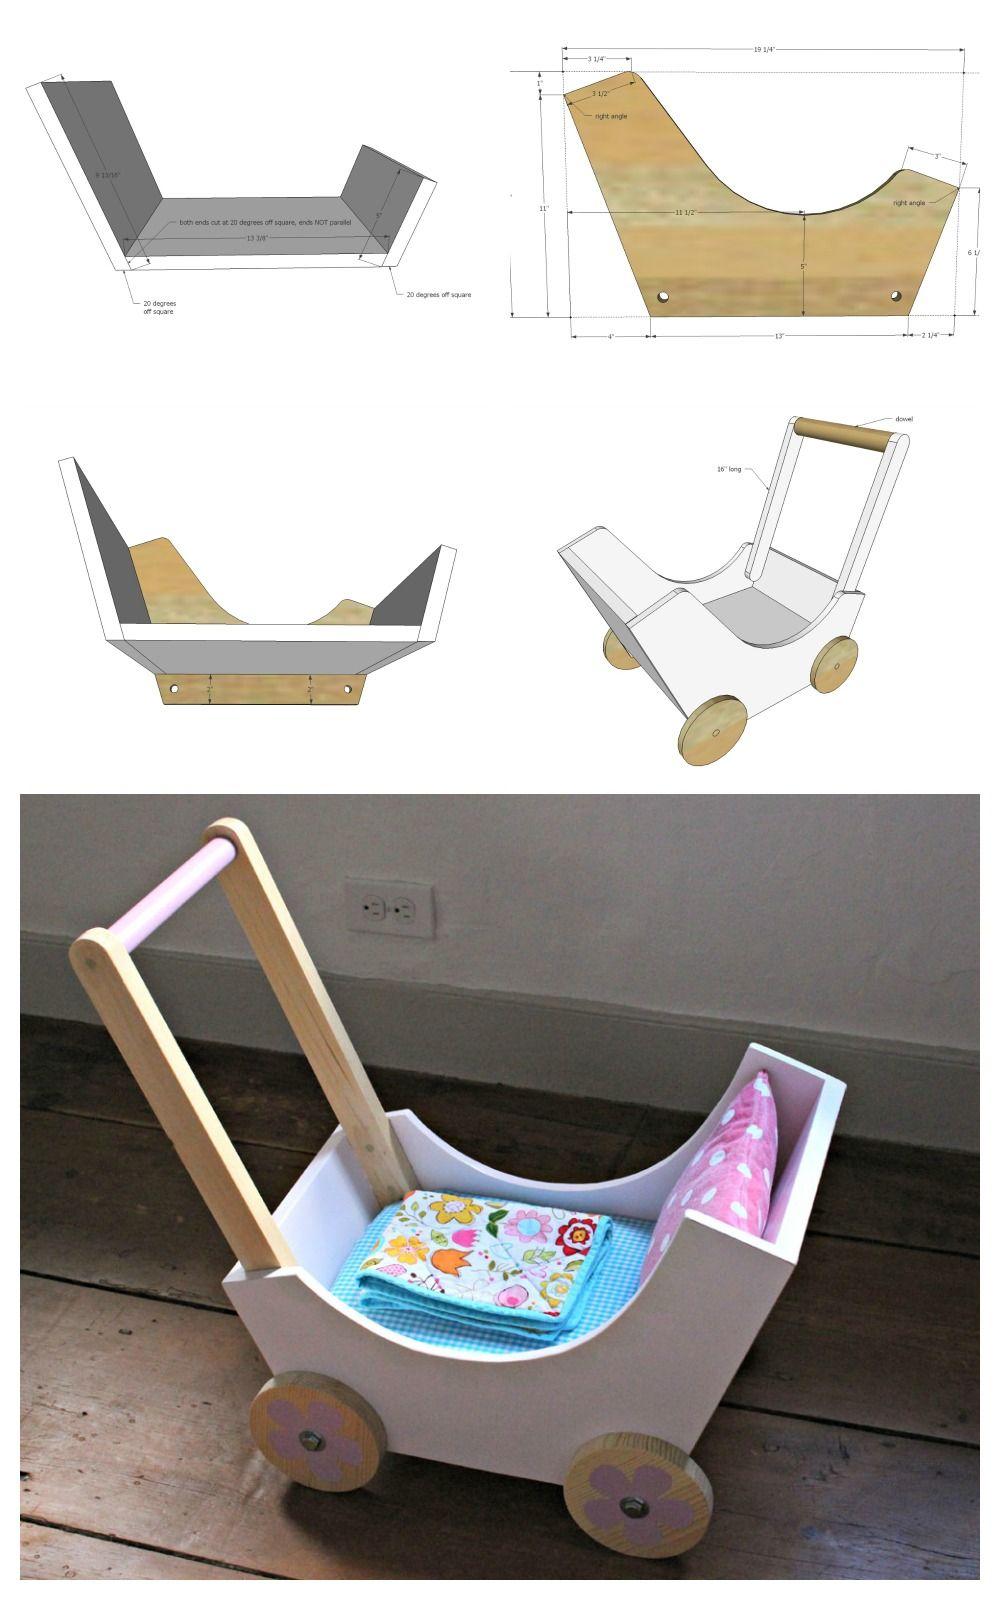 Diy wooden baby chair - Diy Wood Stroller Plans